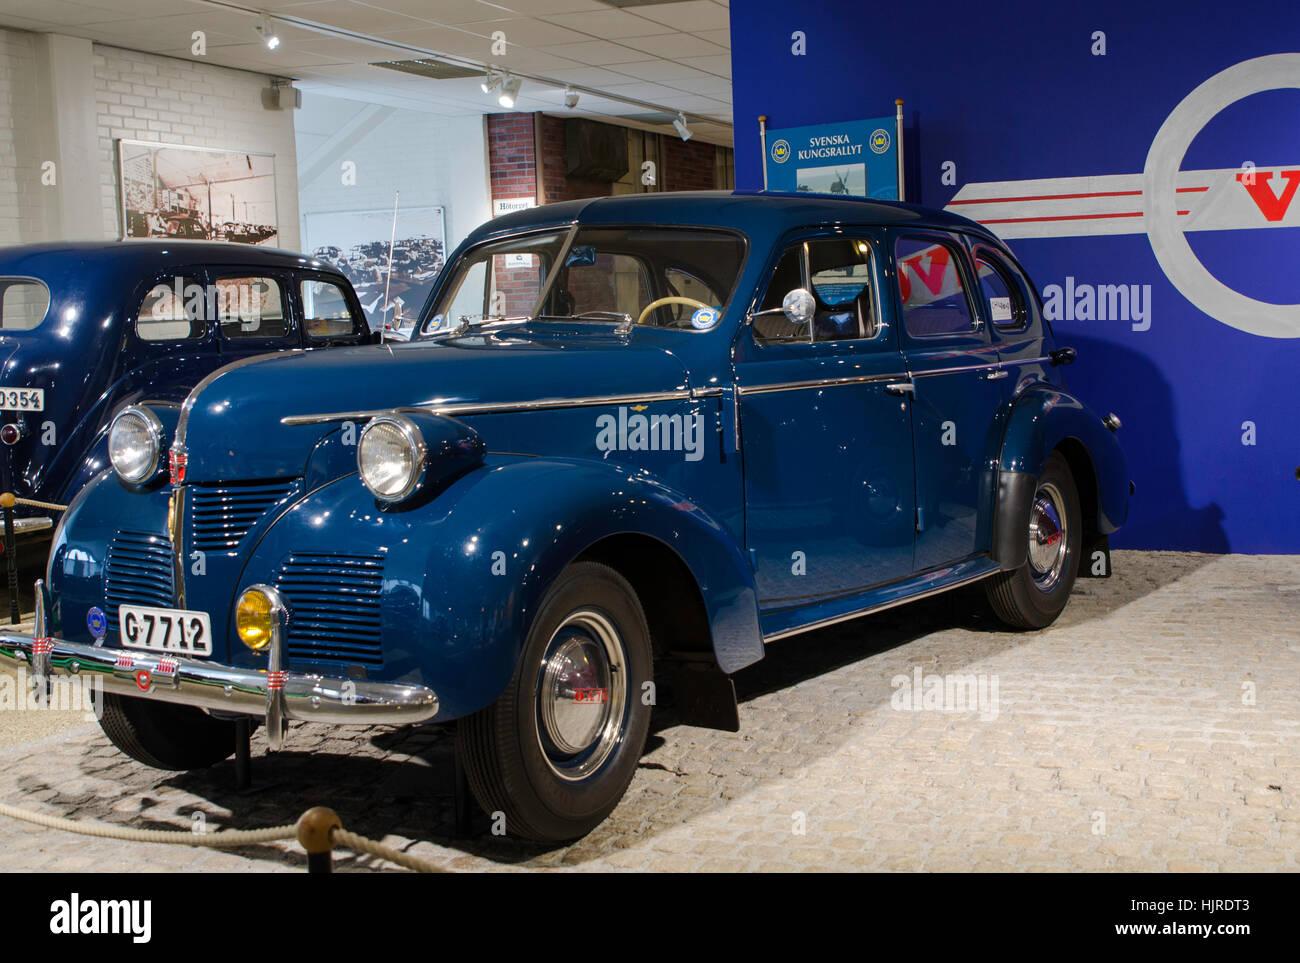 Old Volvo Car Stock Photo 132052147 Alamy